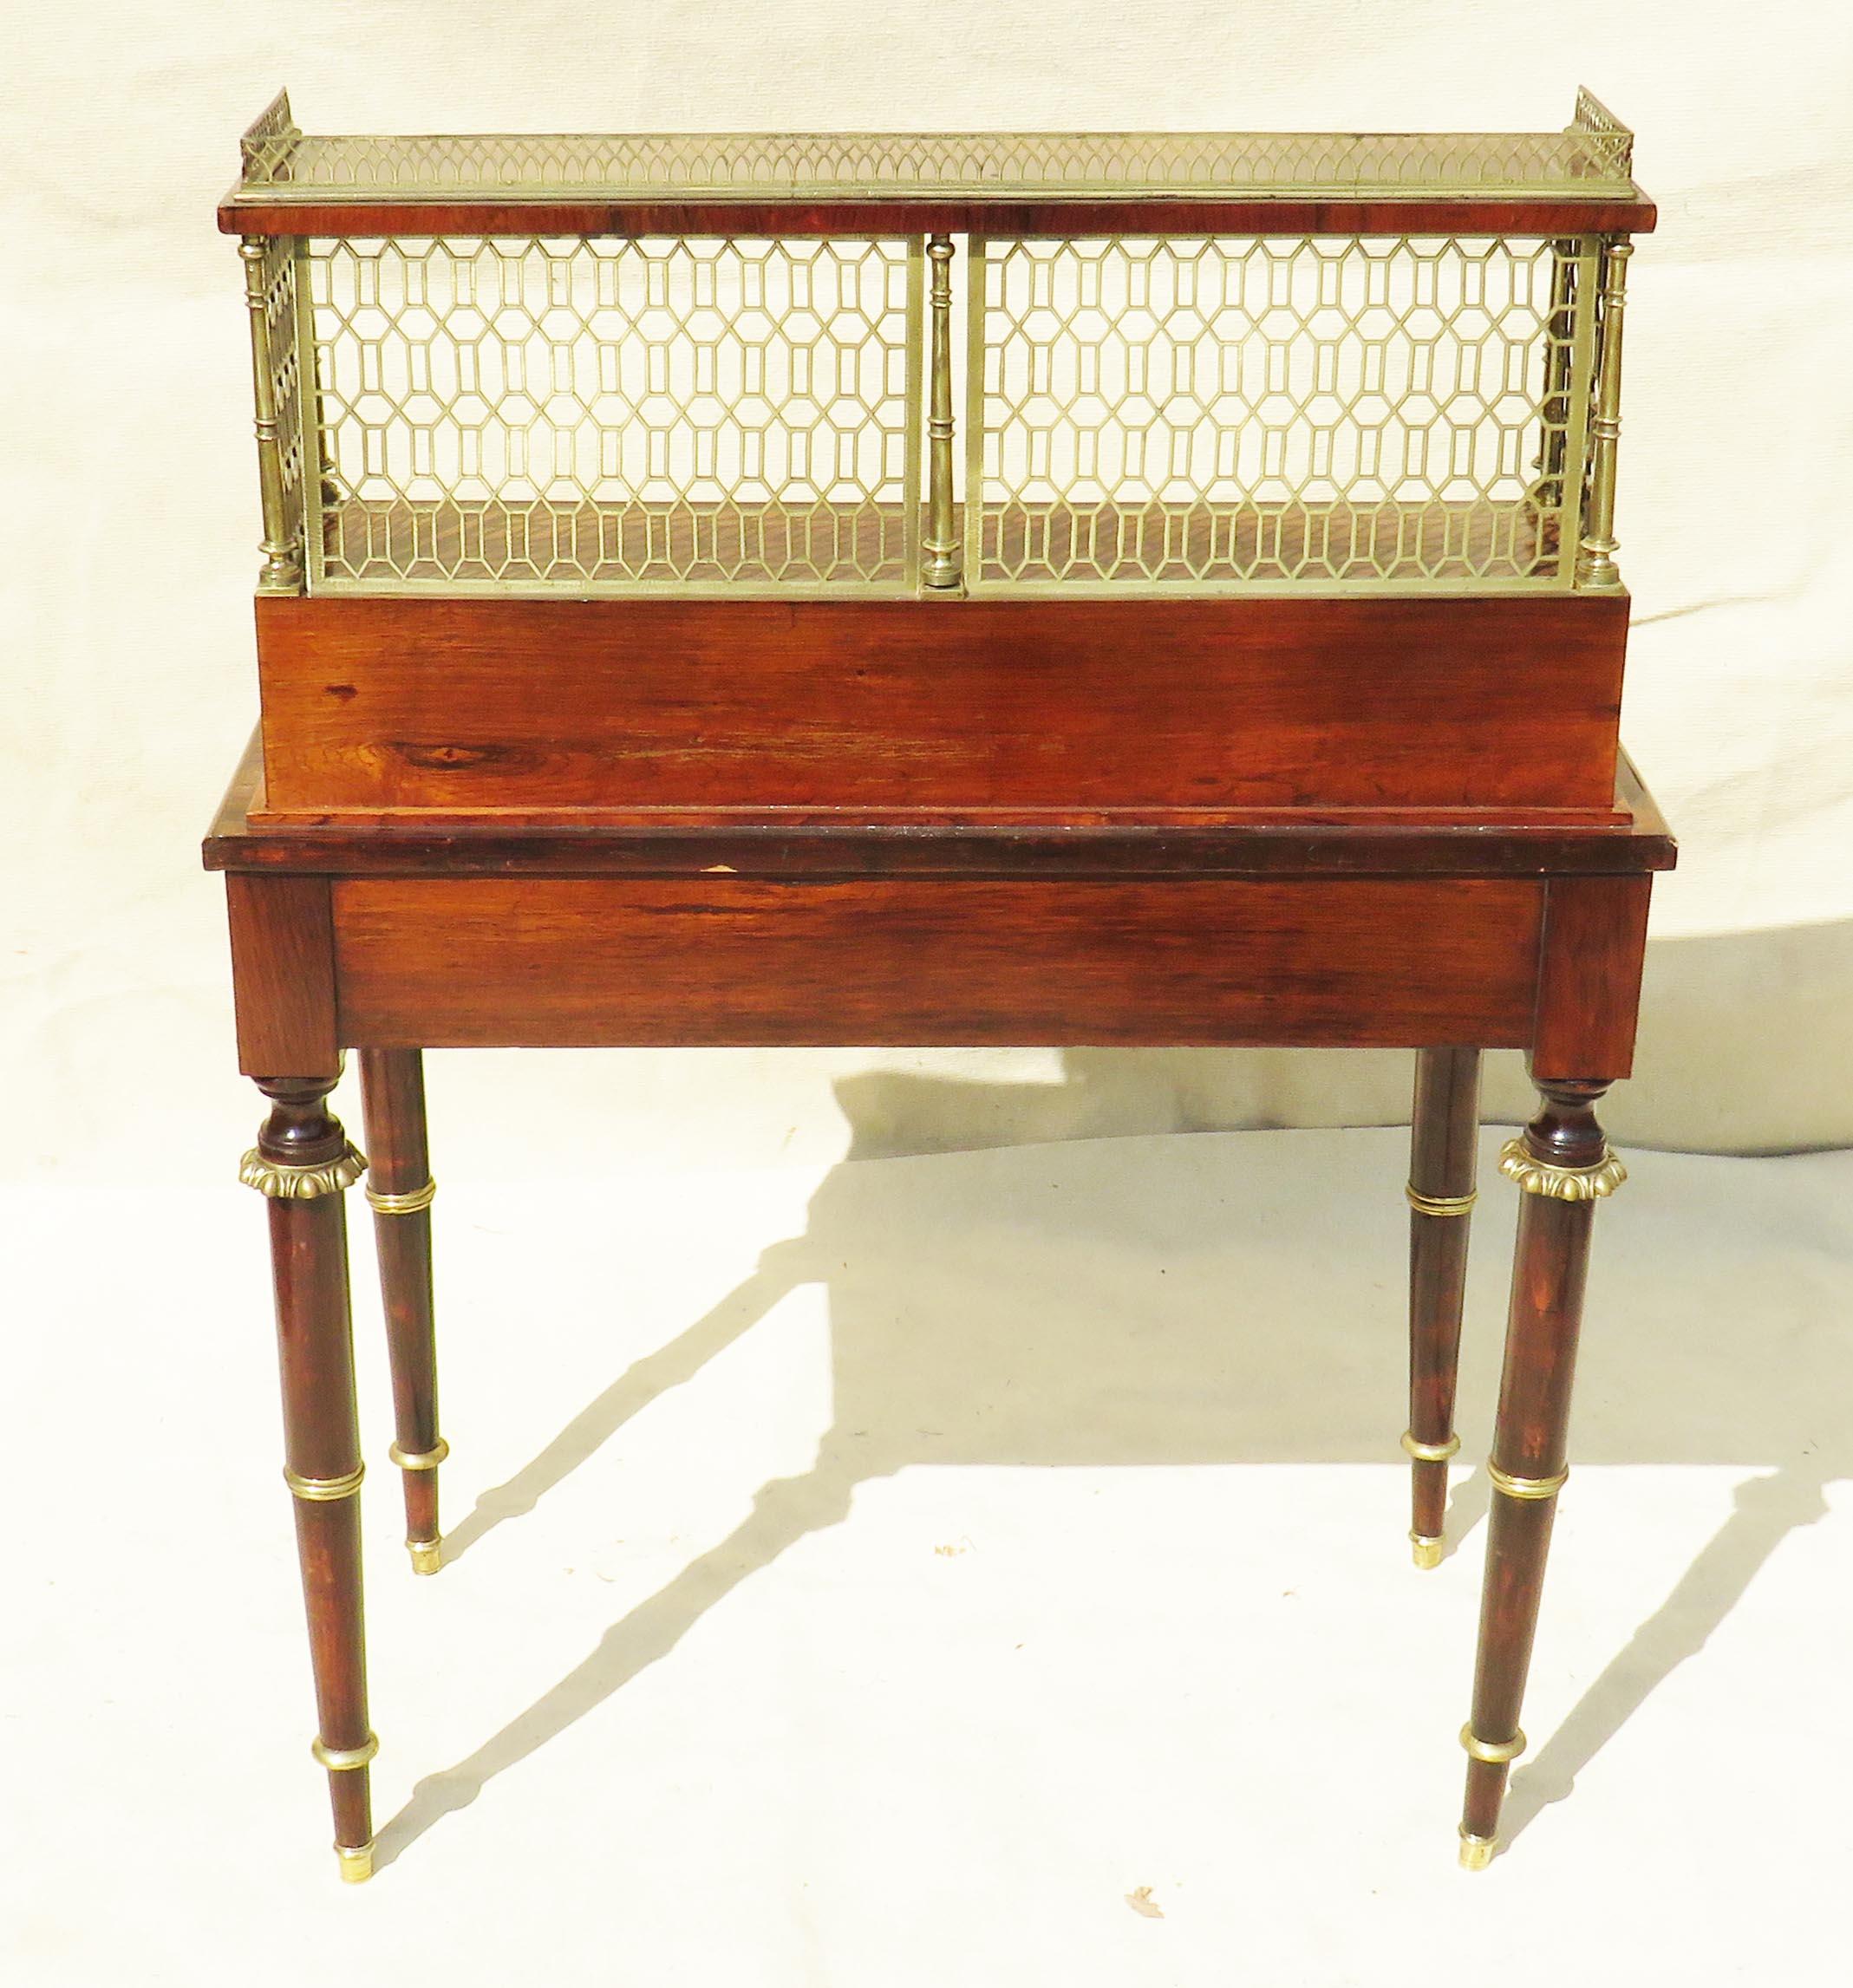 Lot 16 - Superb quality Regency period early 19th Century rosewood bonheur du jour